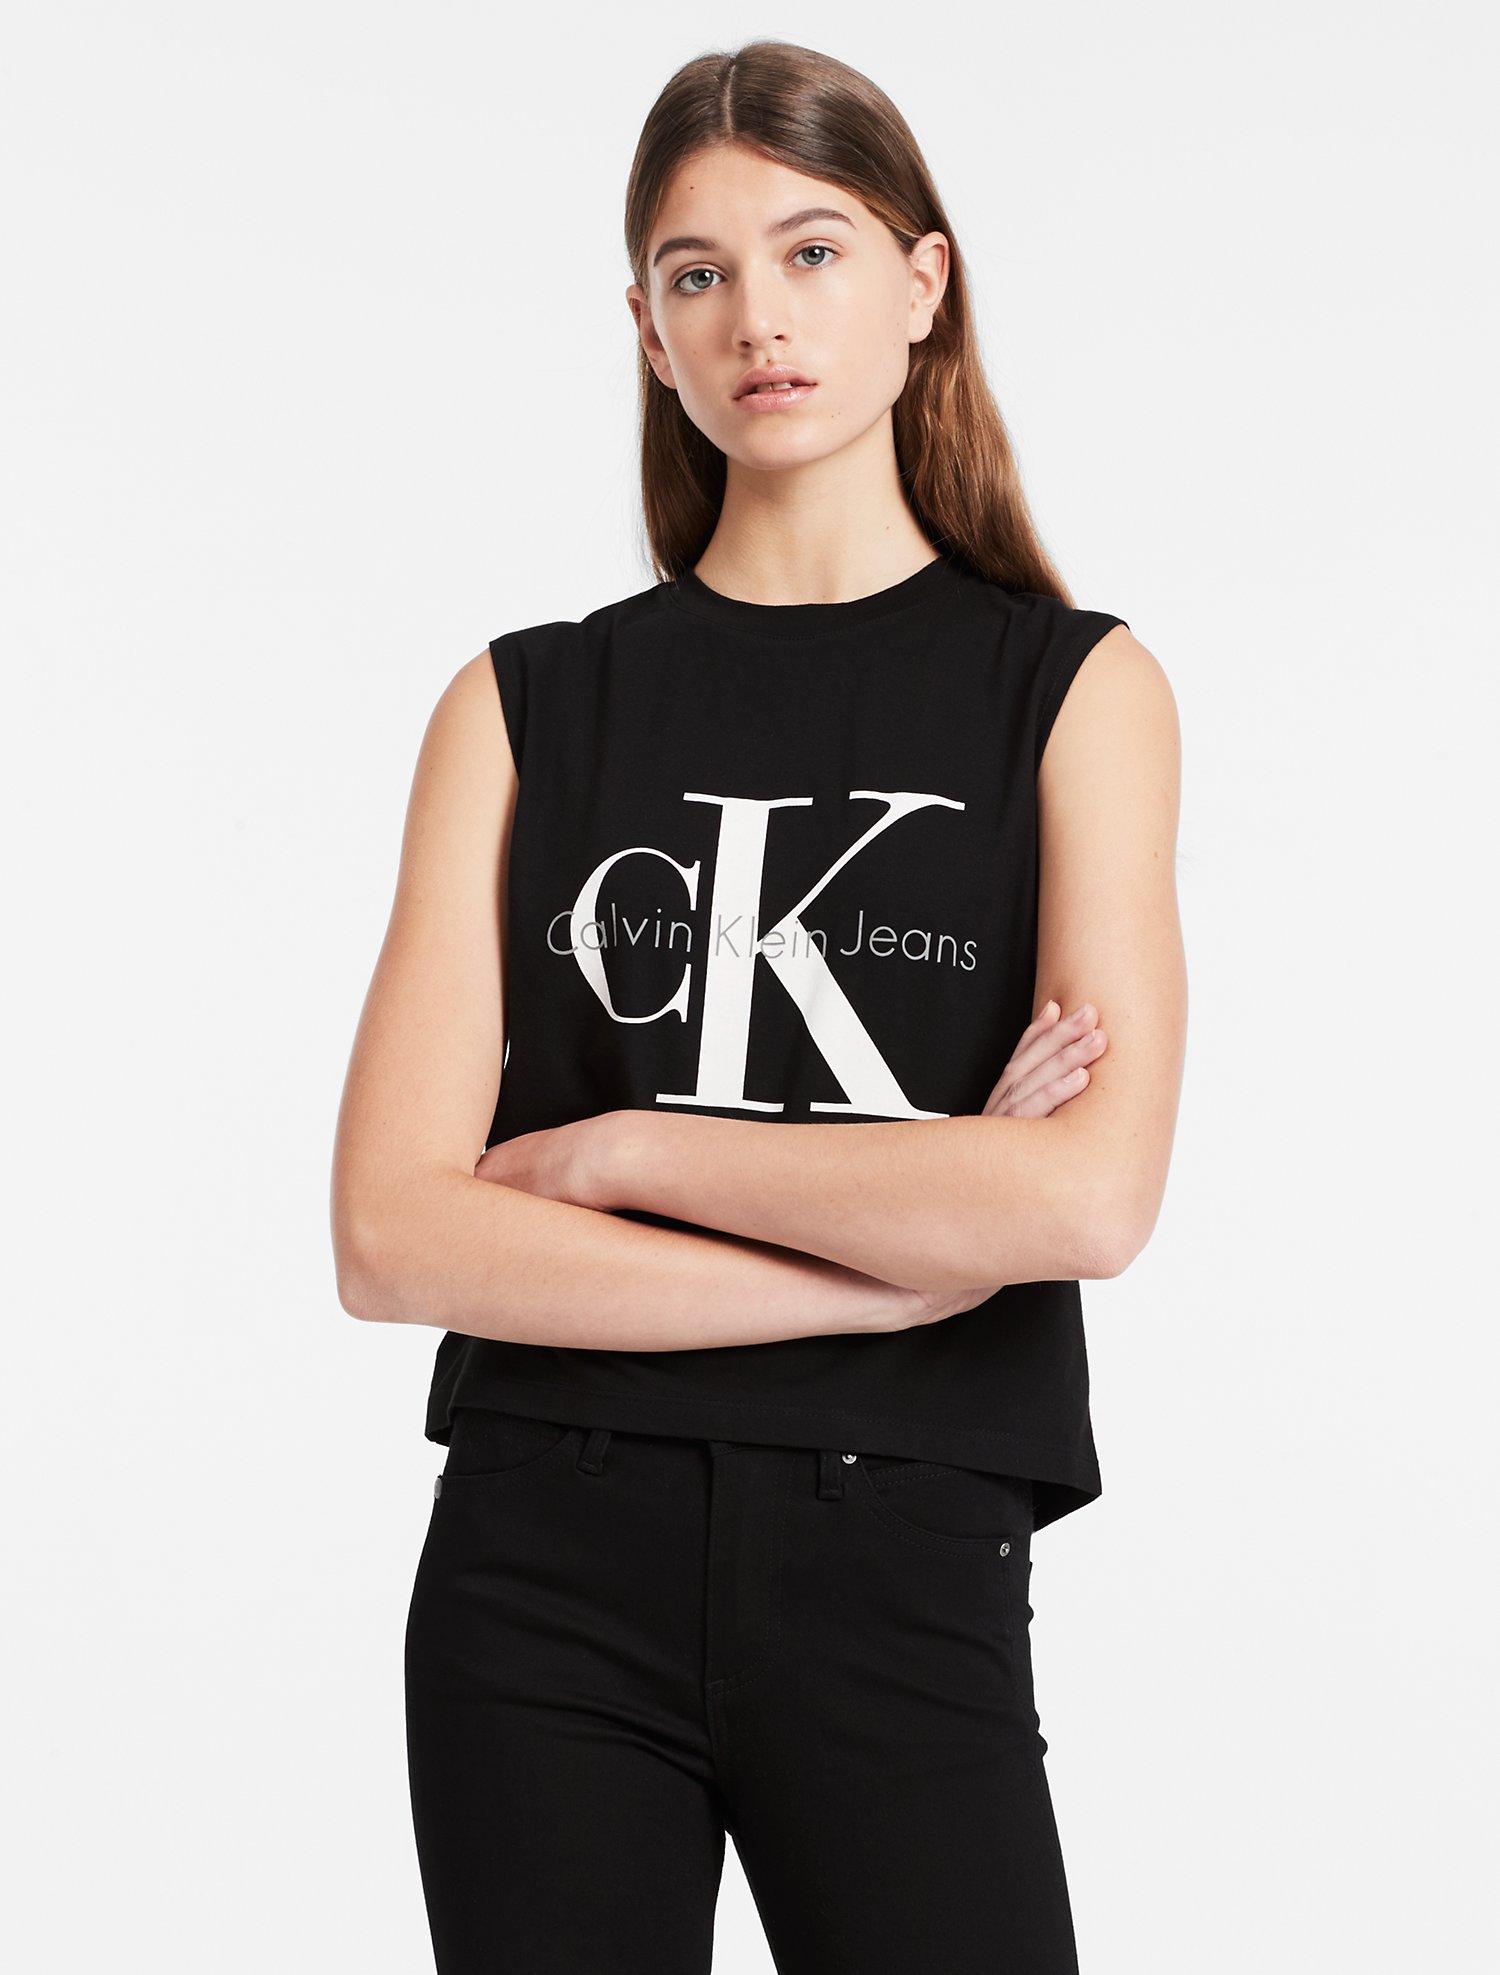 Calvin Klein Model Id Bellazon